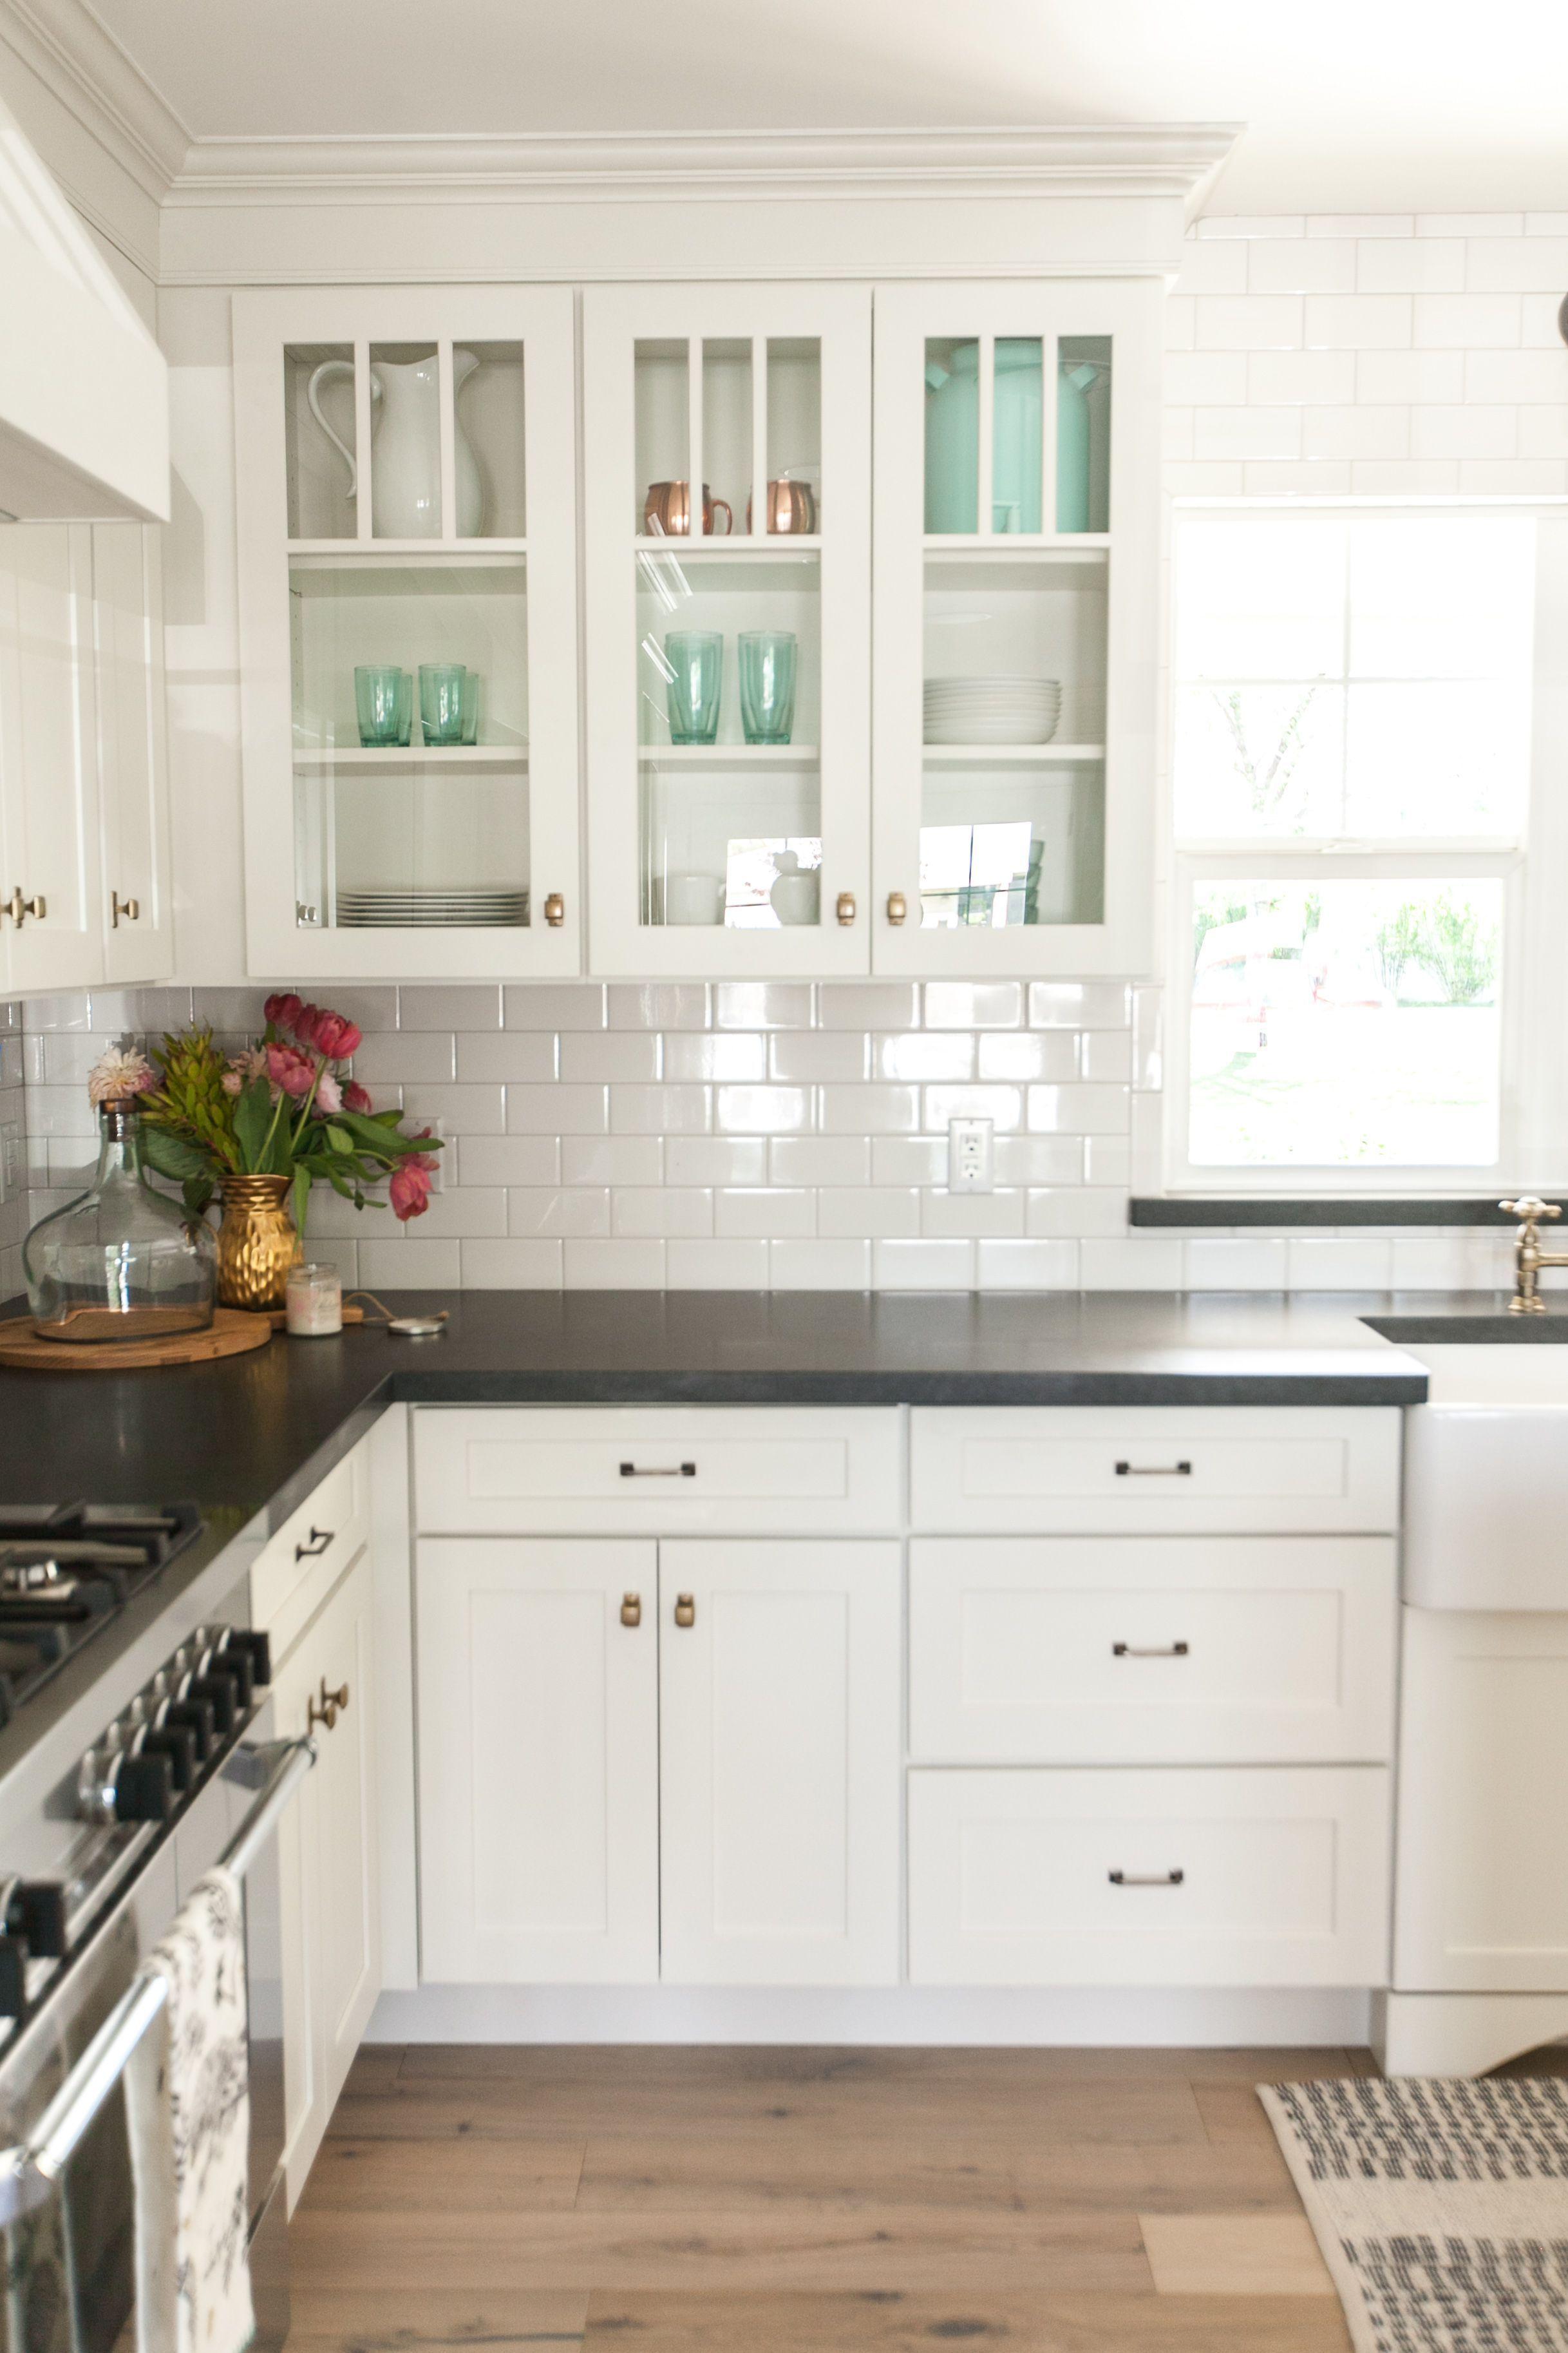 Black Countertops Kitchen Black Countertops In 2020 Kitchen Cabinets Decor New Kitchen Cabinets Kitchen Interior